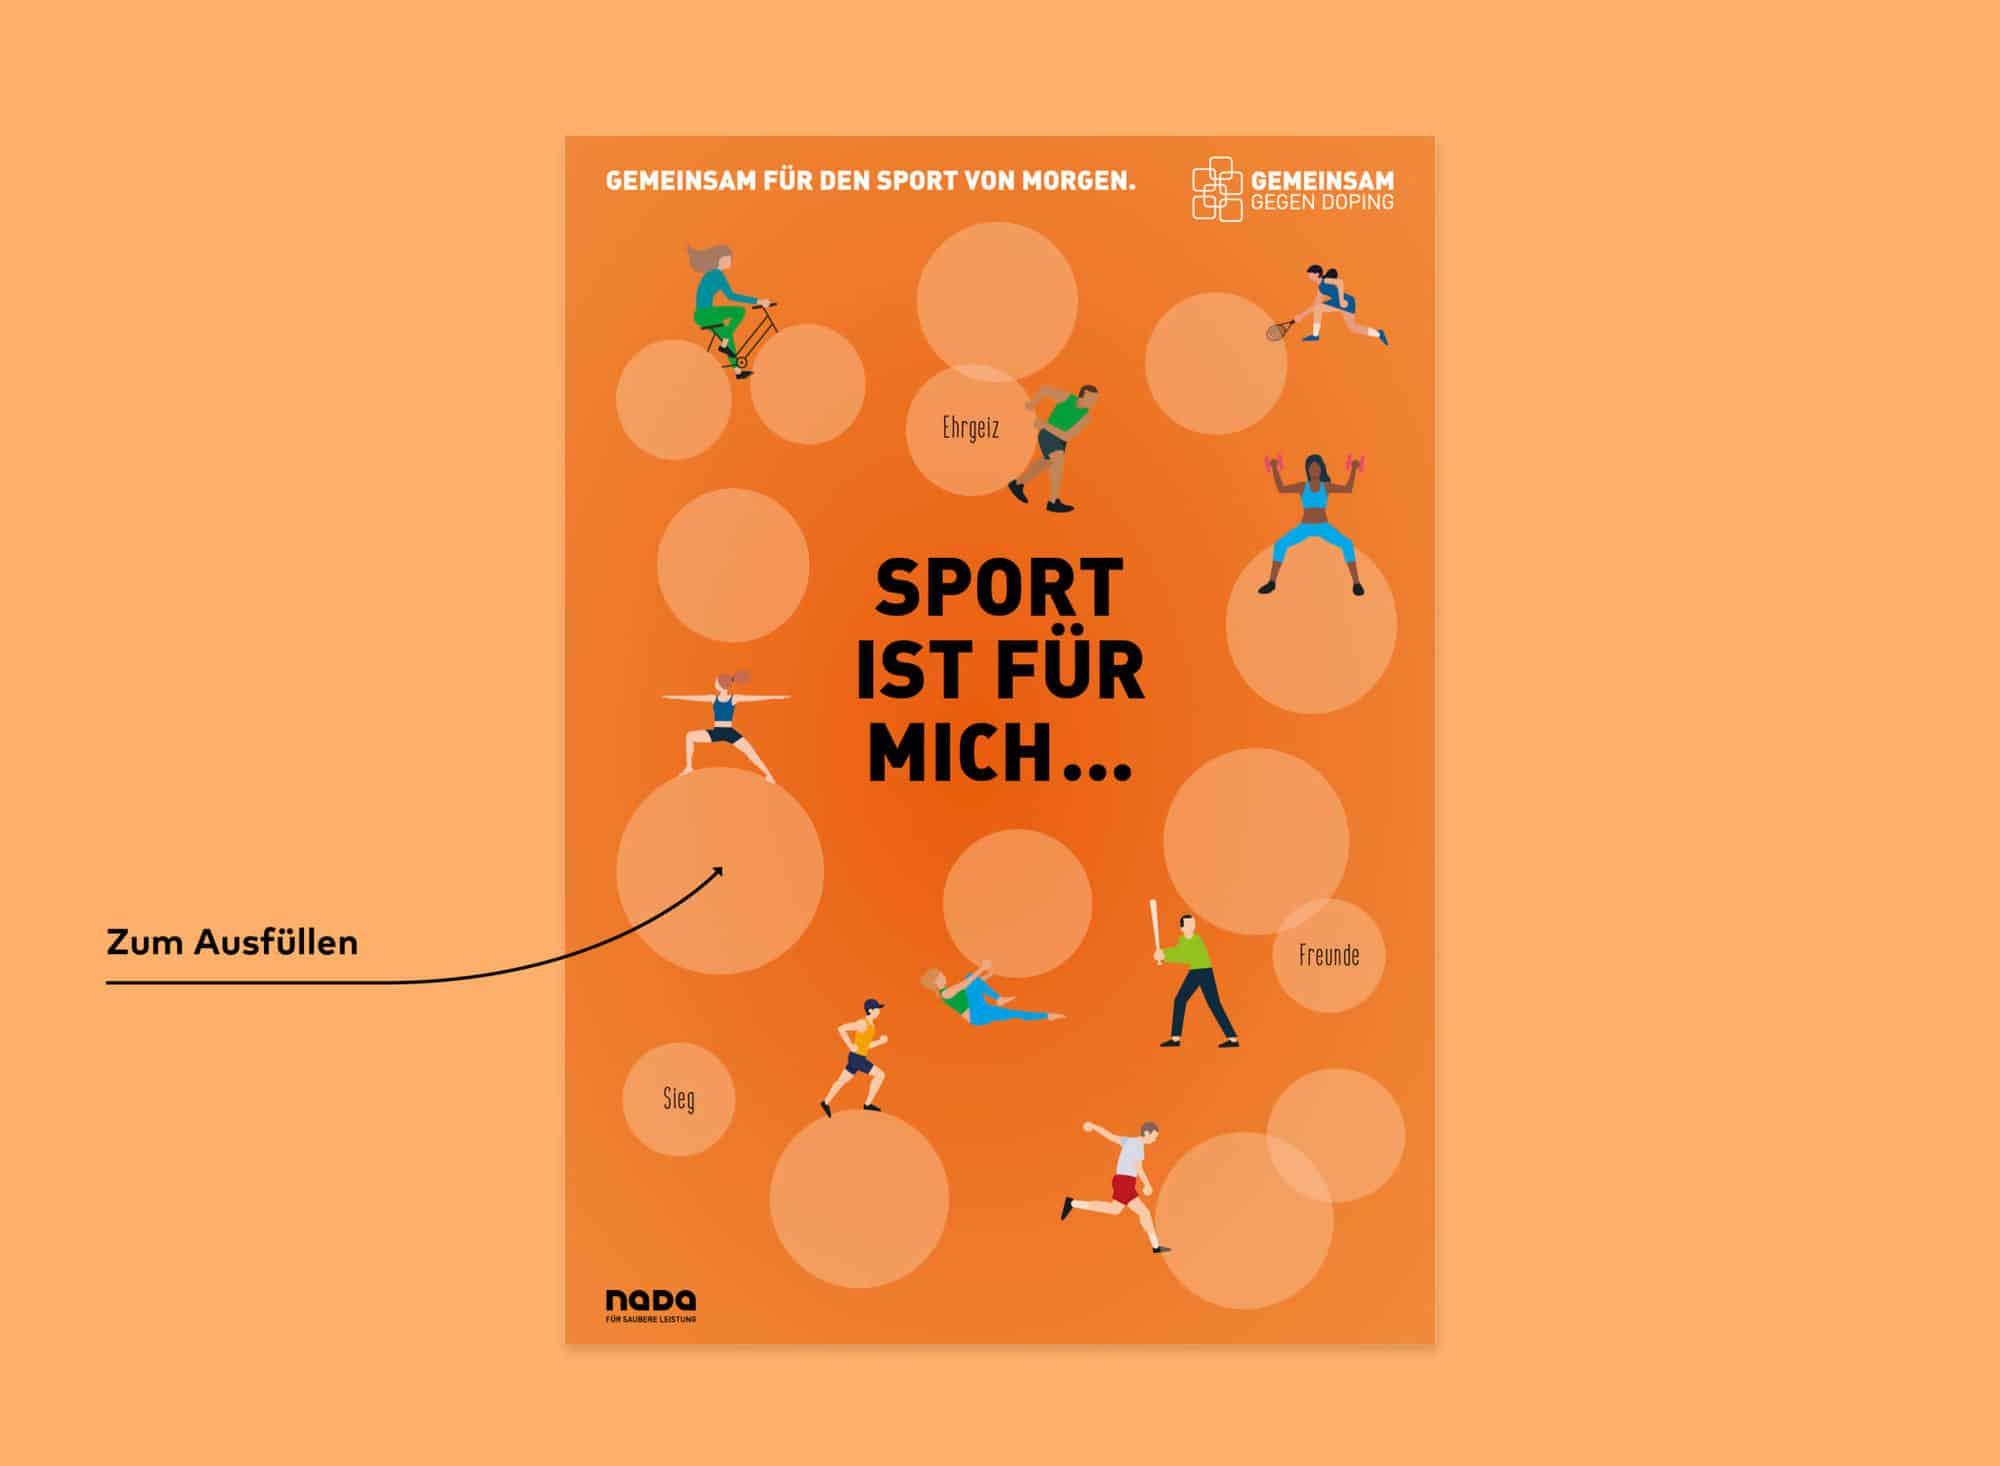 Nada Broschüre Printdesign